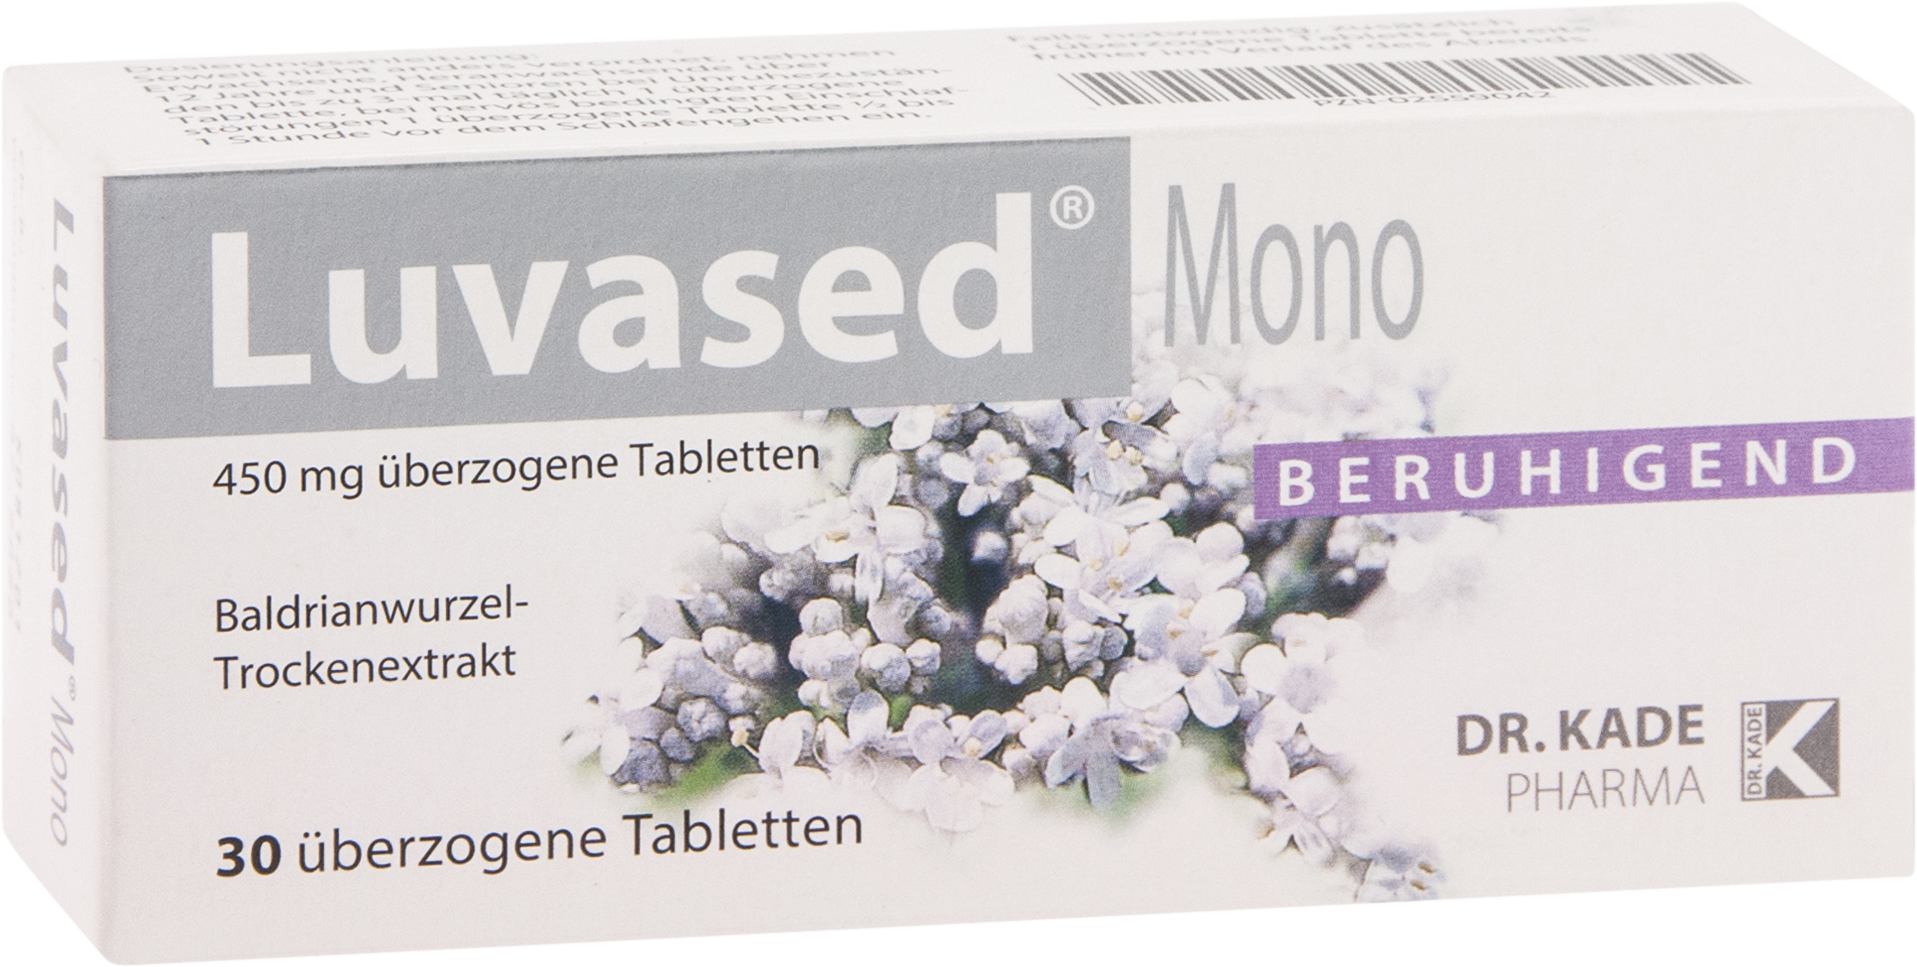 Luvased mono überzogene Tabletten